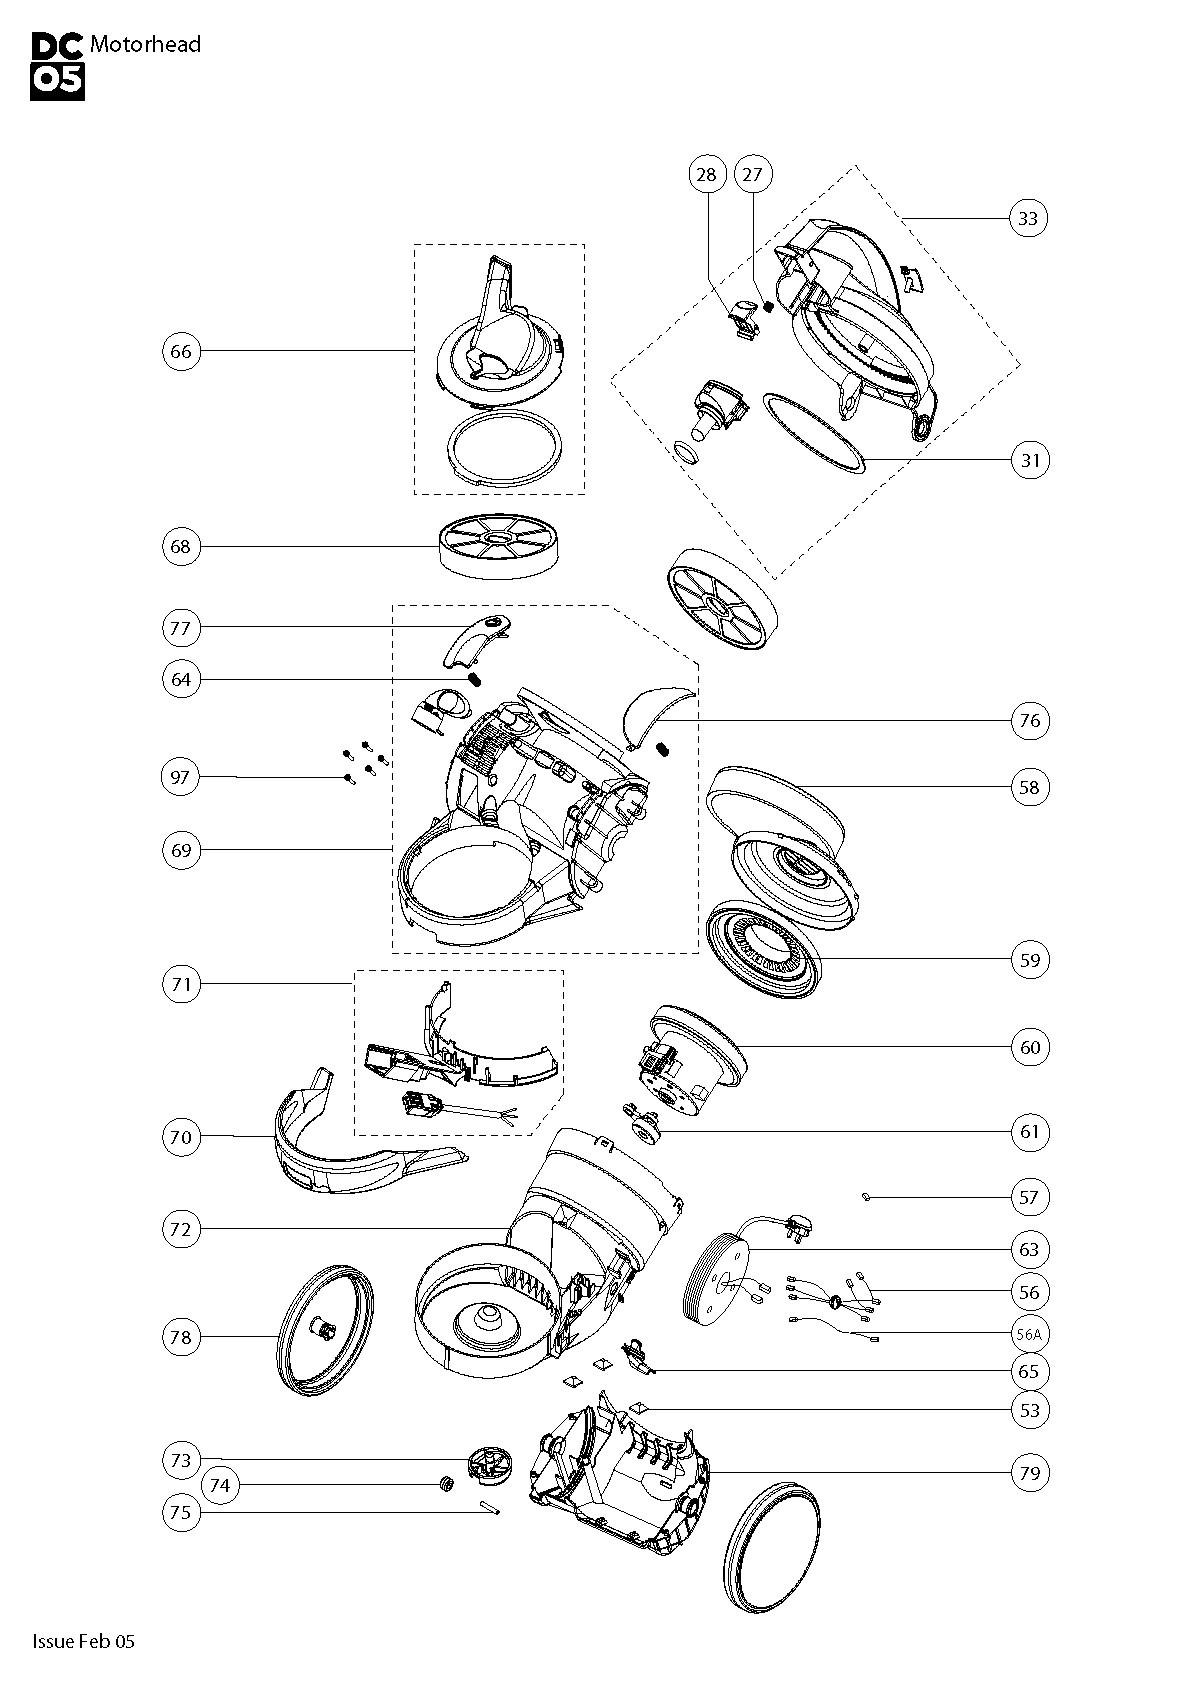 dyson dc17 animal parts diagram basic boat trailer wiring dc15 my